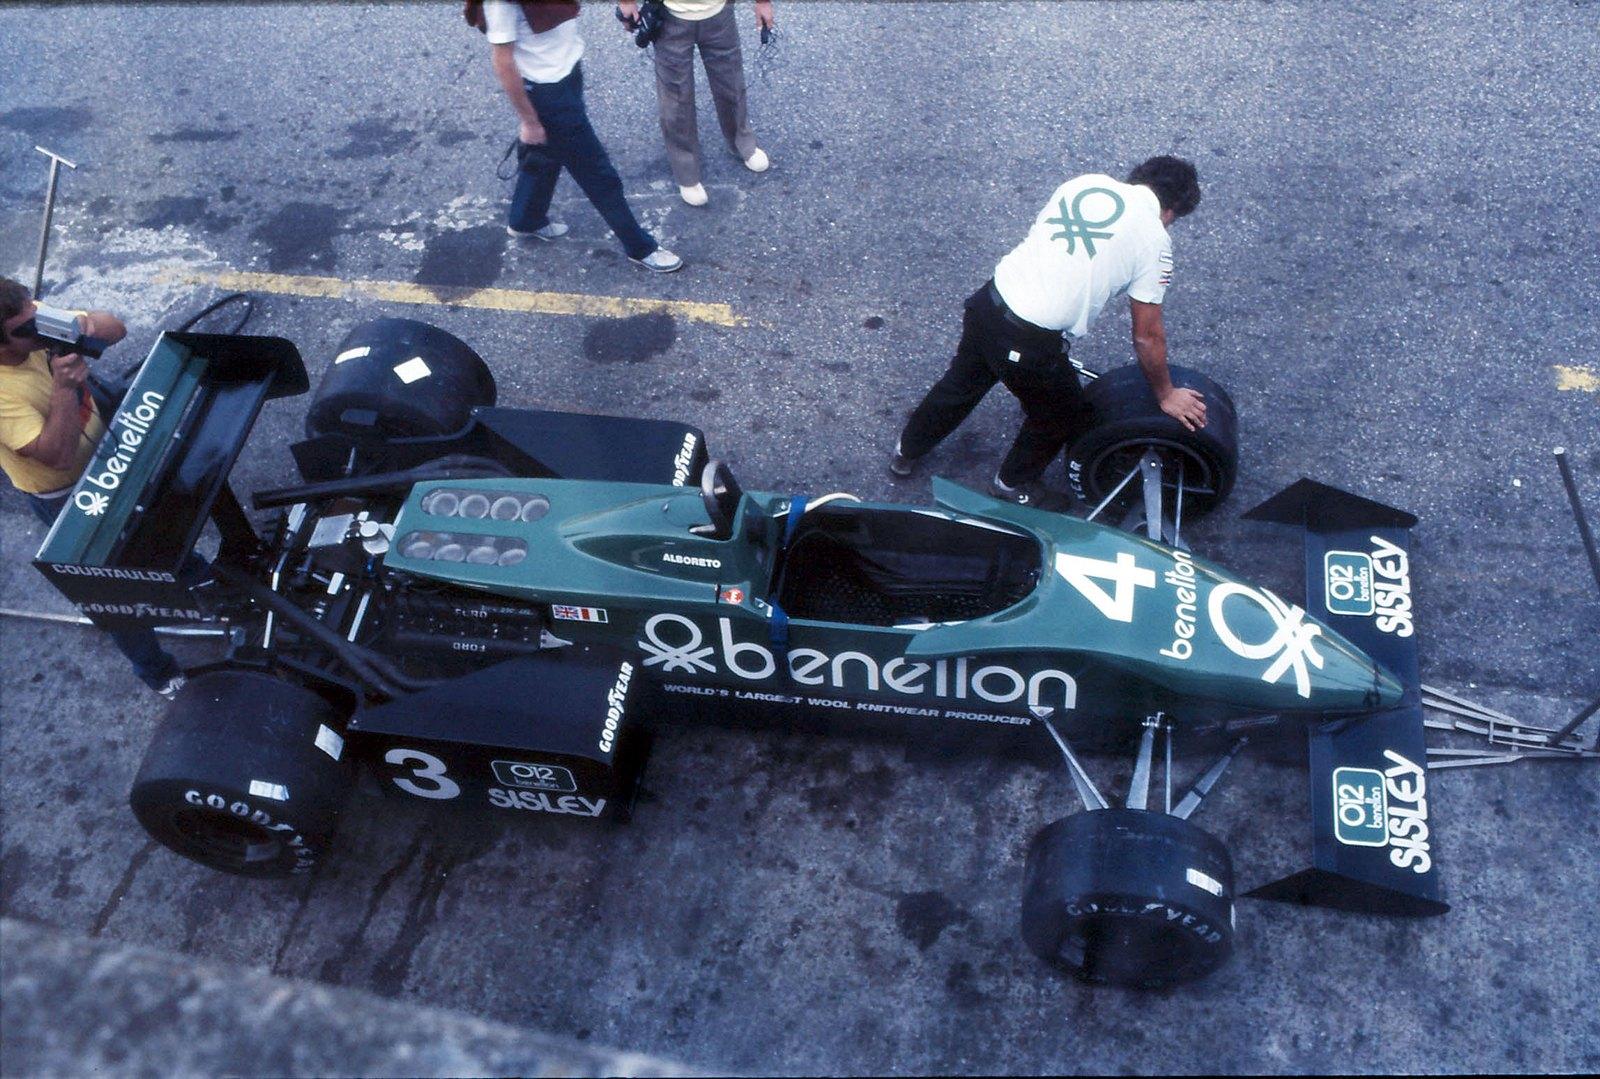 Tyrrel F1 1983 - Monza terrace box...